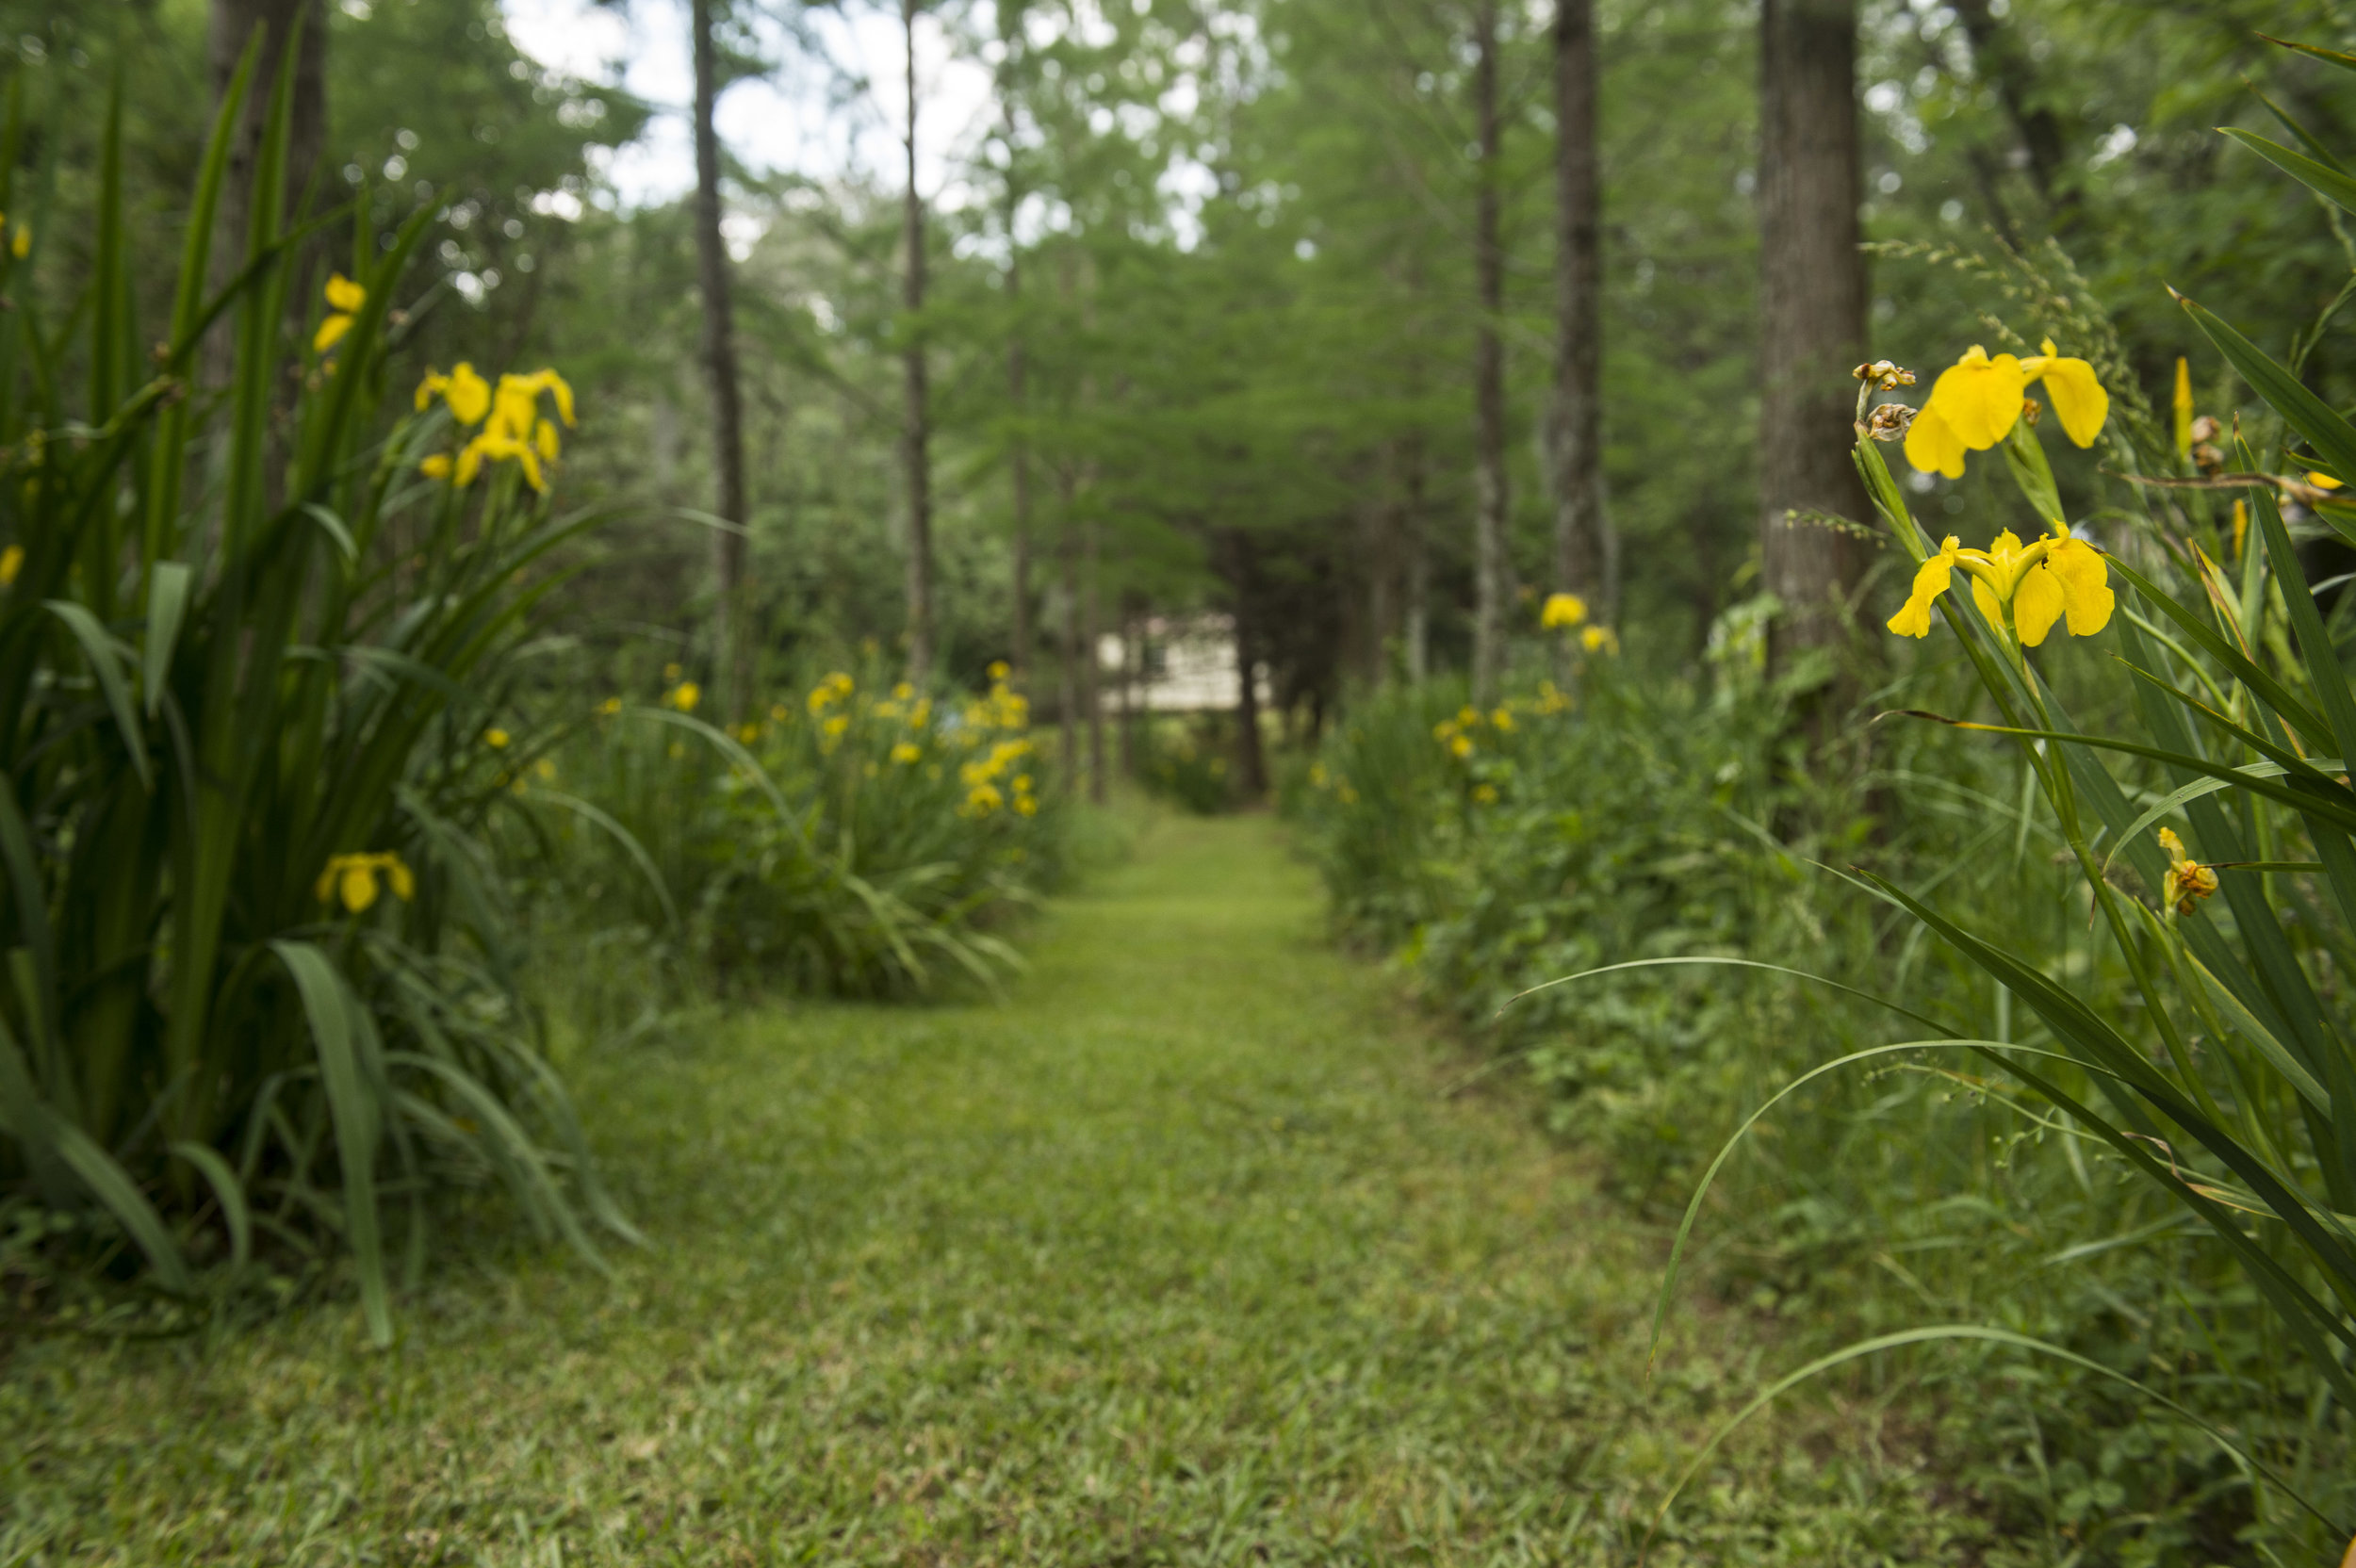 Garden-lined pathways